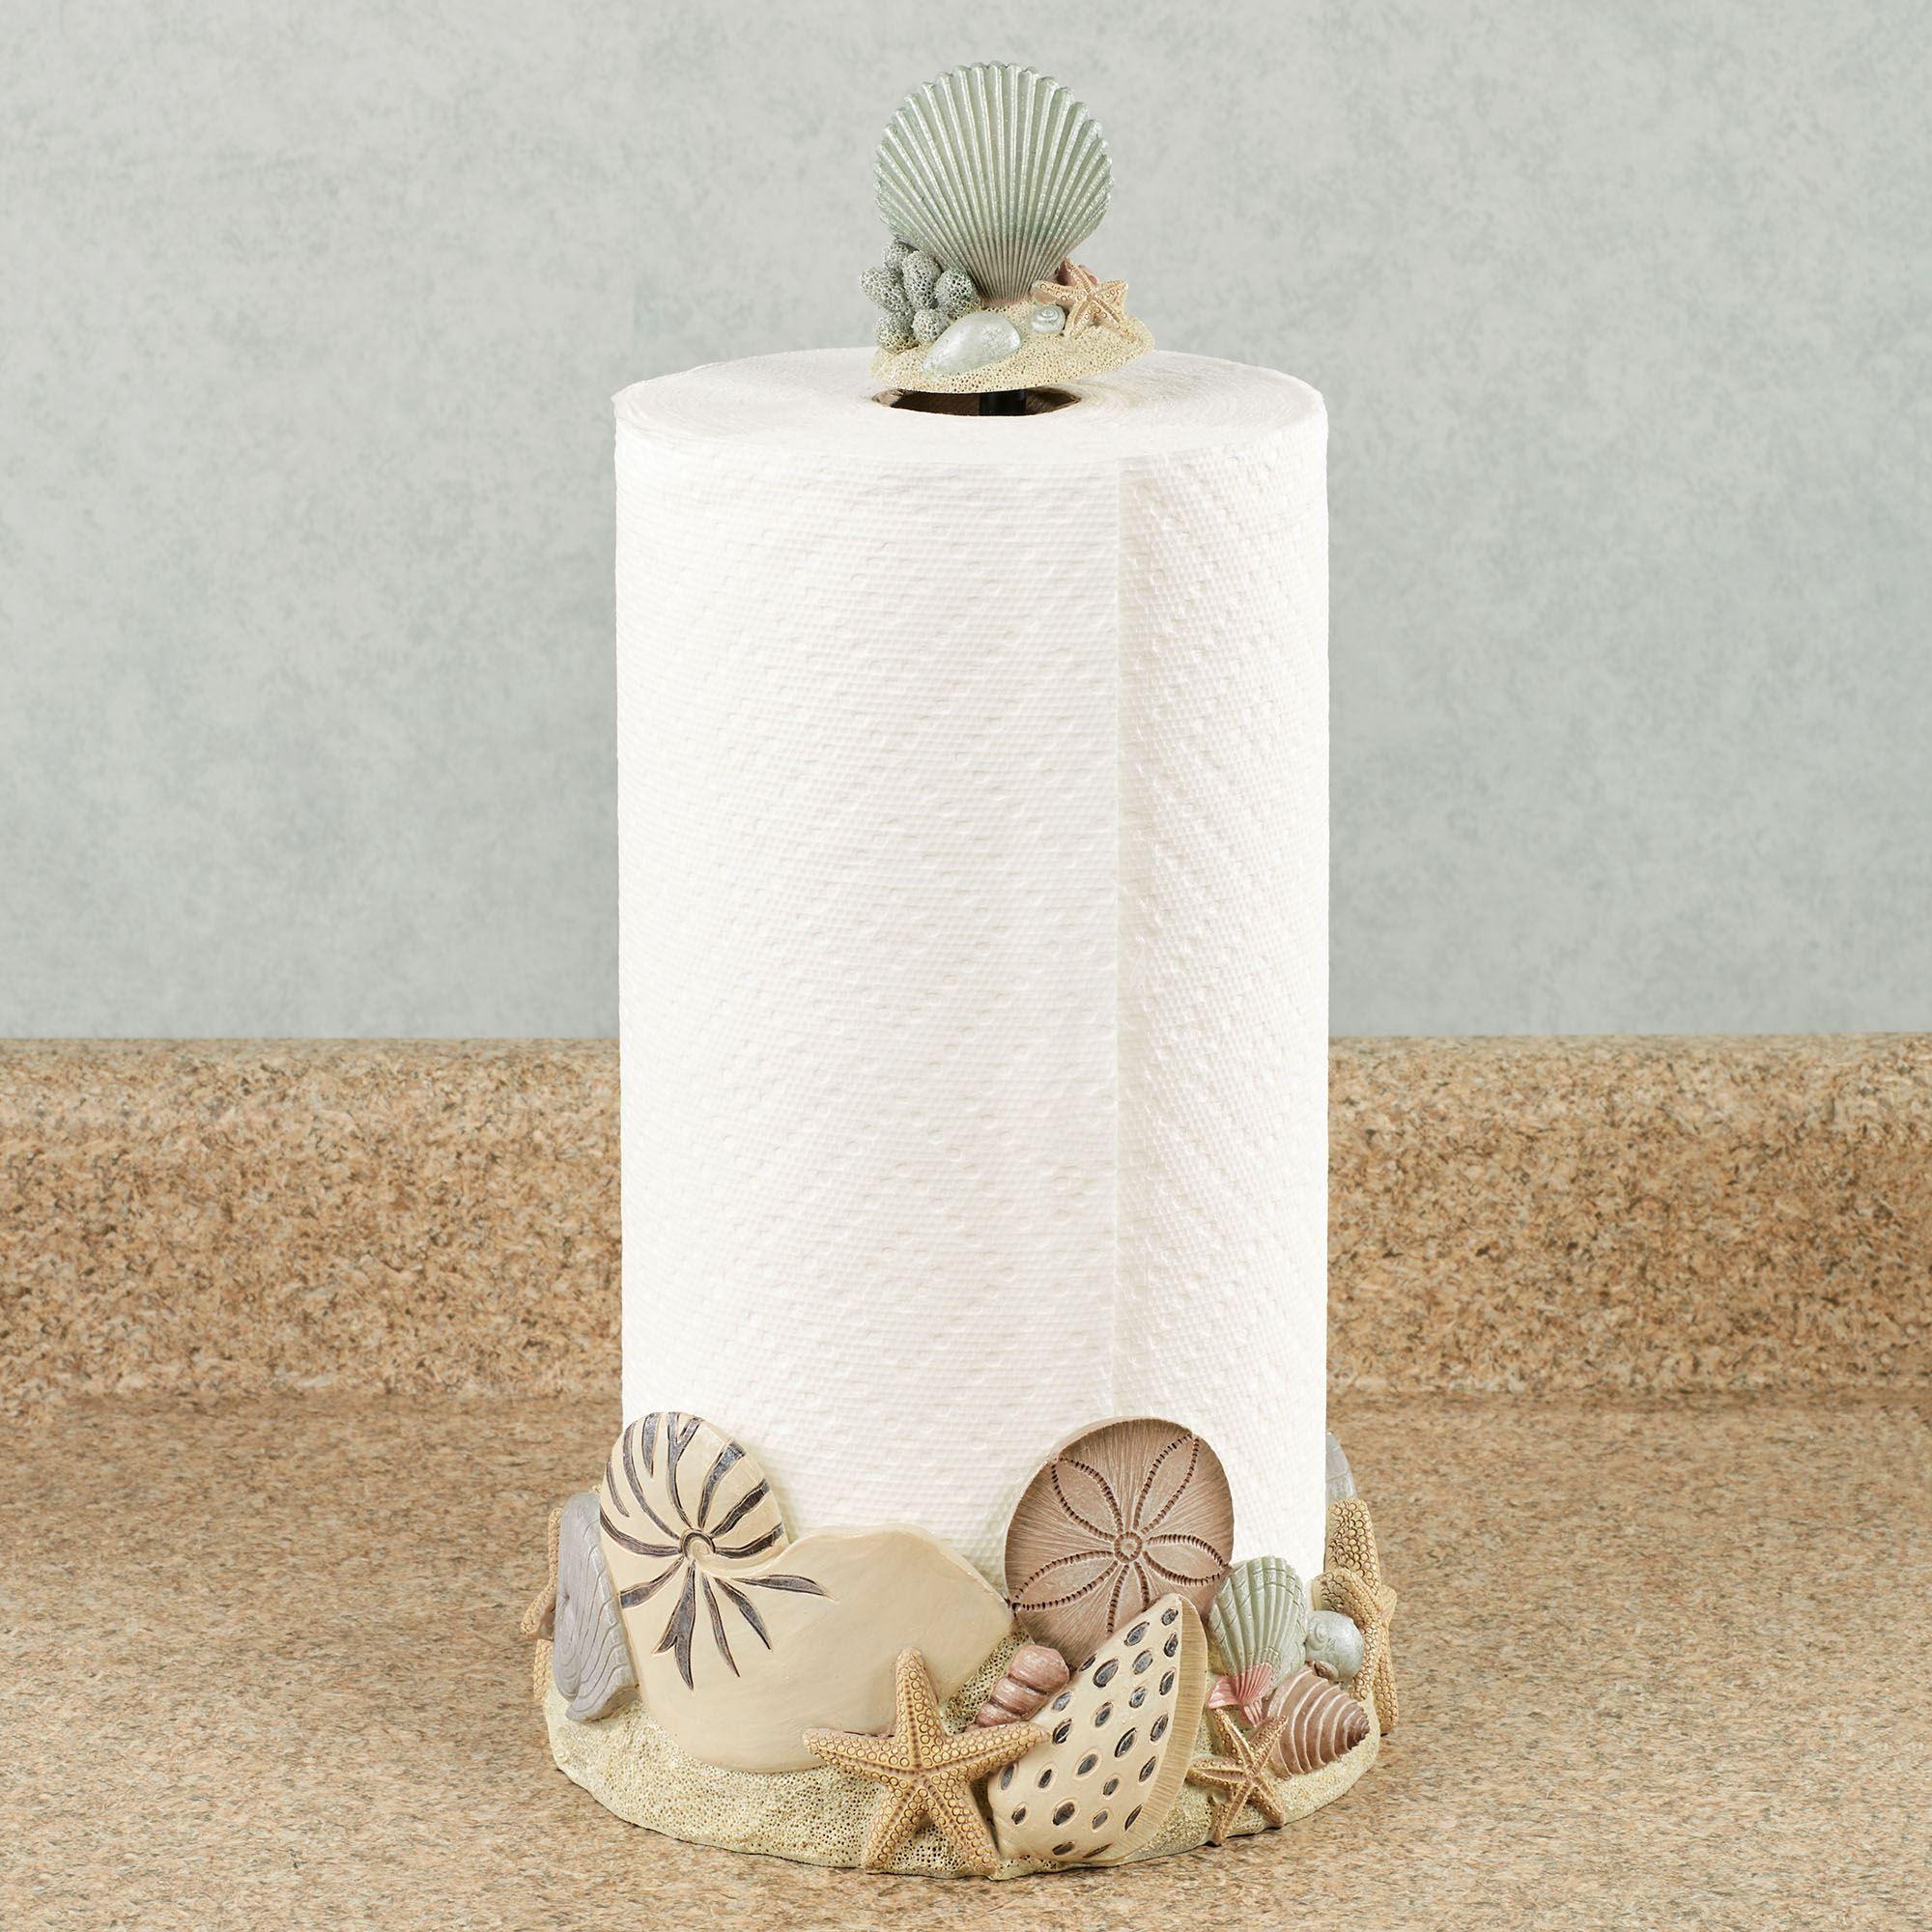 At The Beach Natural Hued Paper Towel Holder